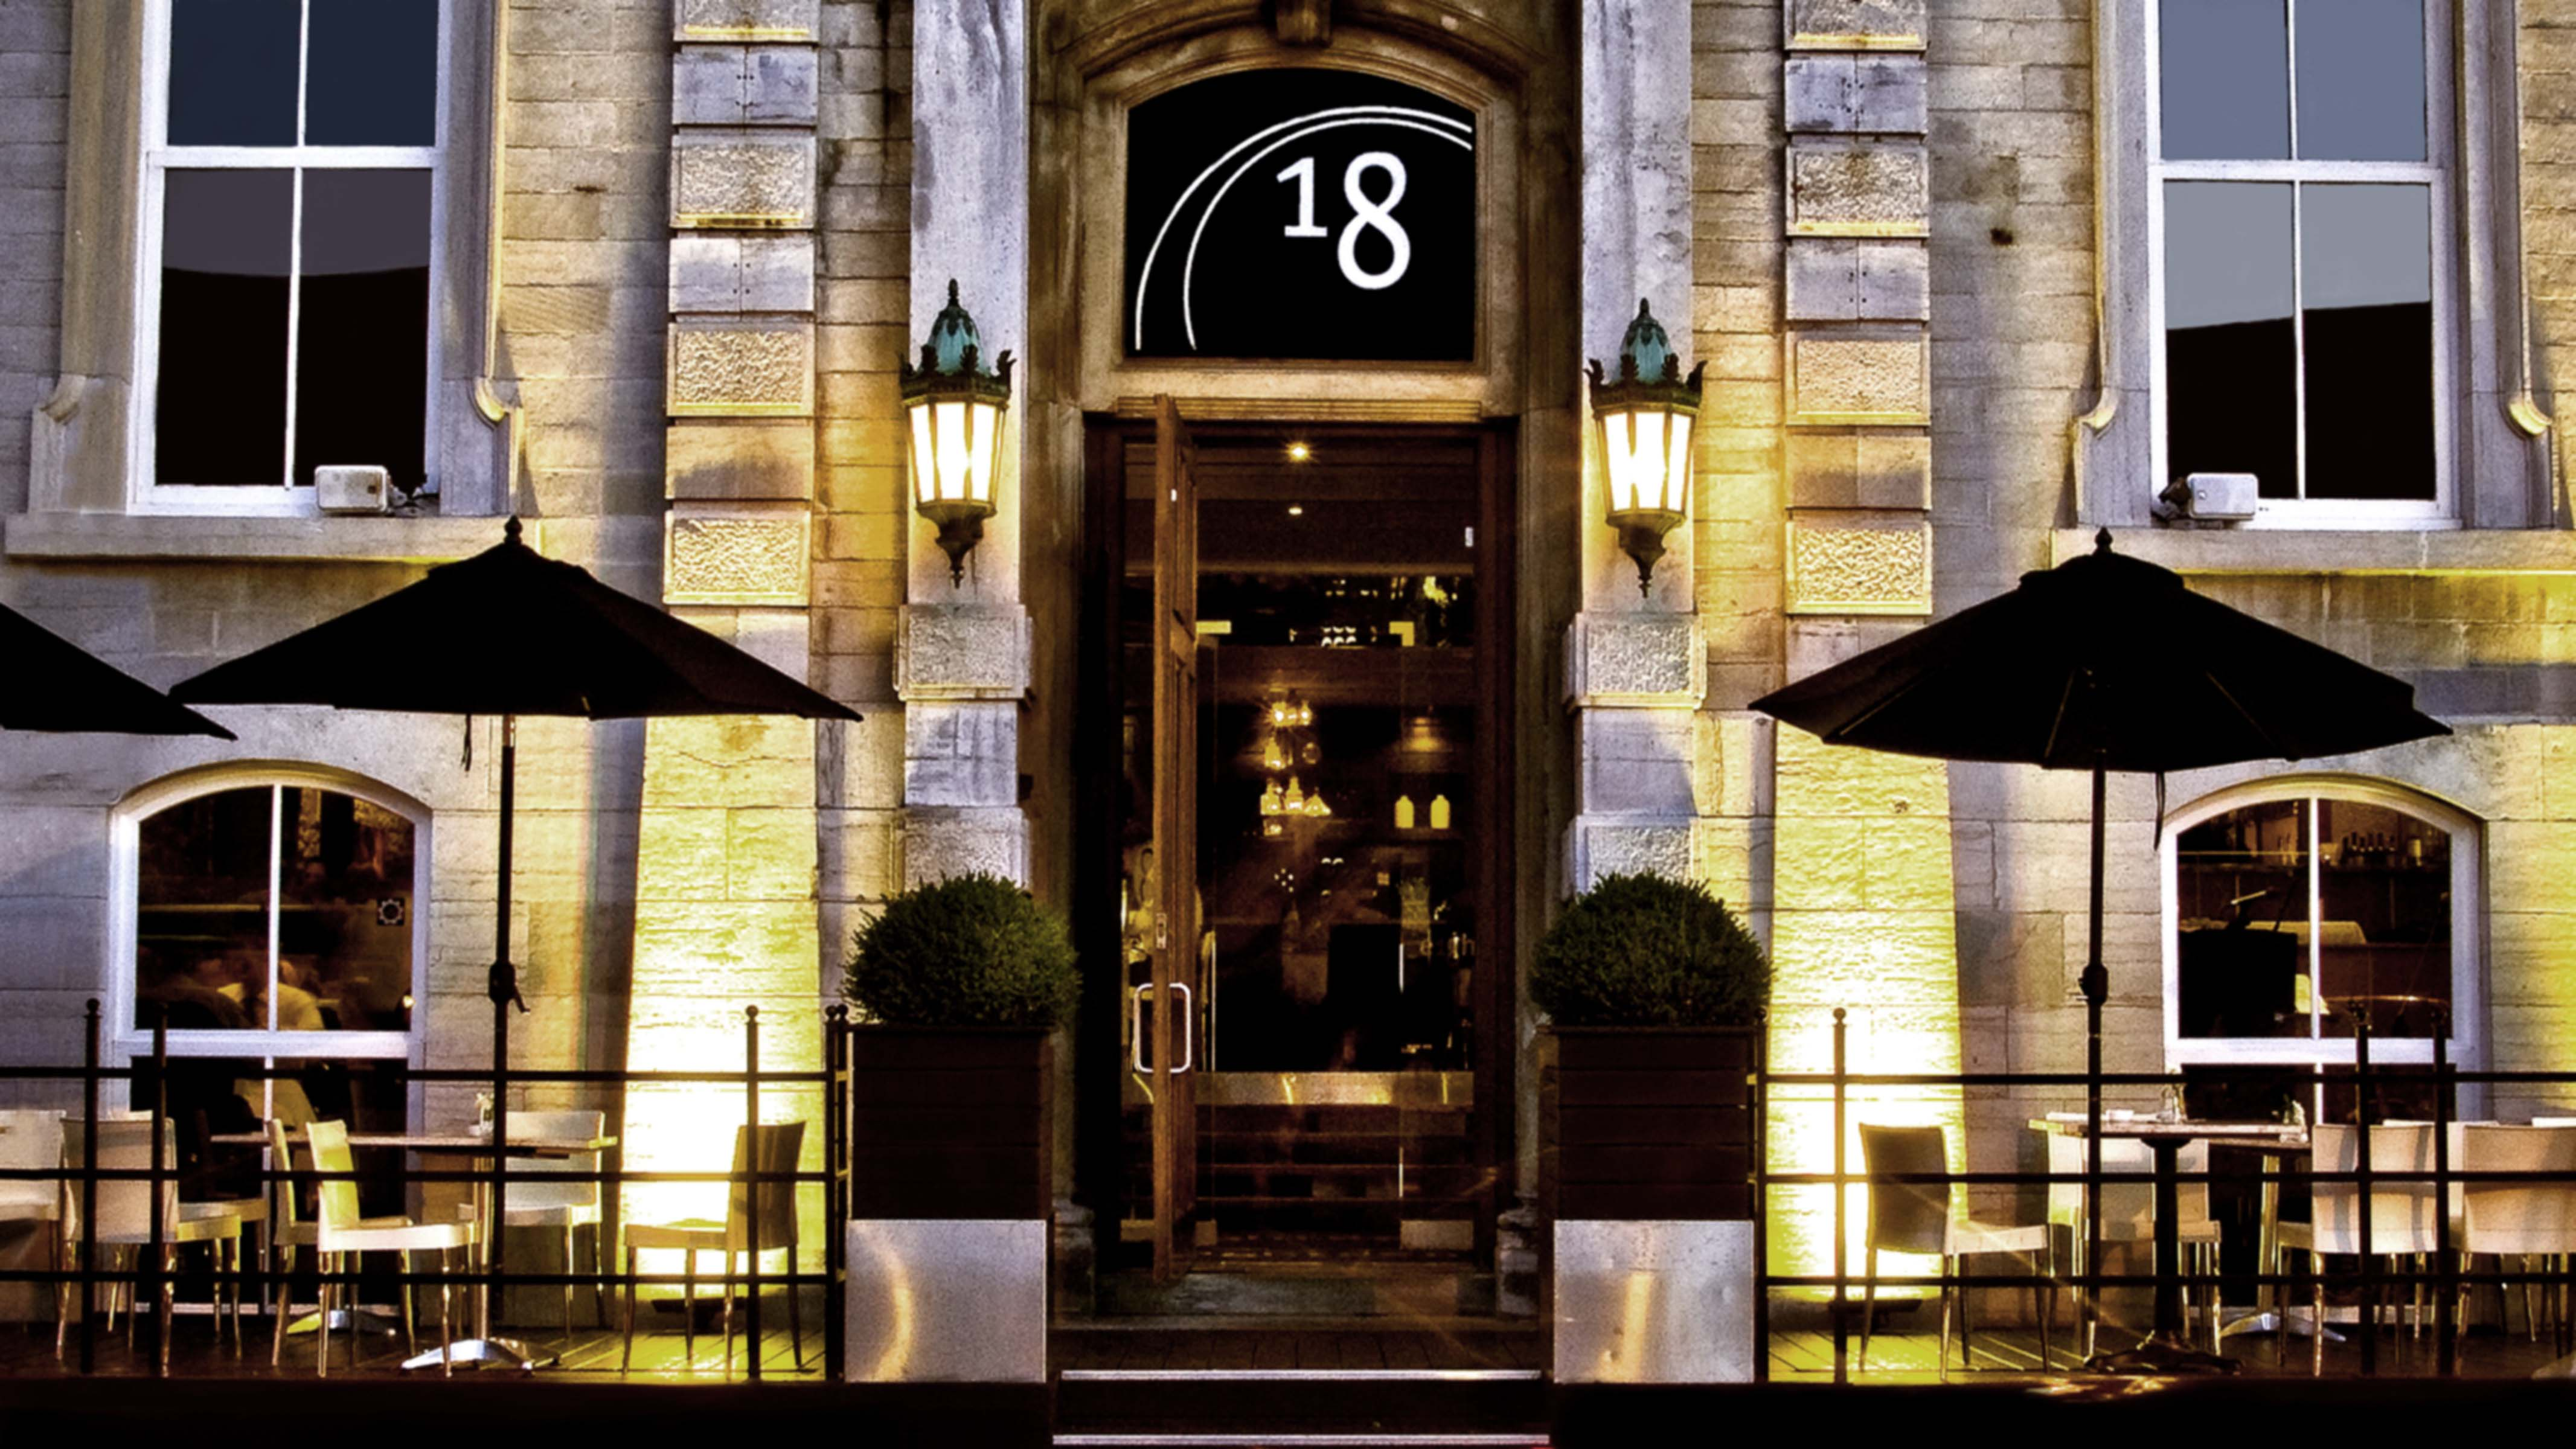 About 187 Restaurant 18 Ottawa Restaurant Steak  : exterior18web ID 32836592 c1cb 476e 85b0 1a434c6532e6 from www.restaurant18.com size 4266 x 2400 jpeg 671kB